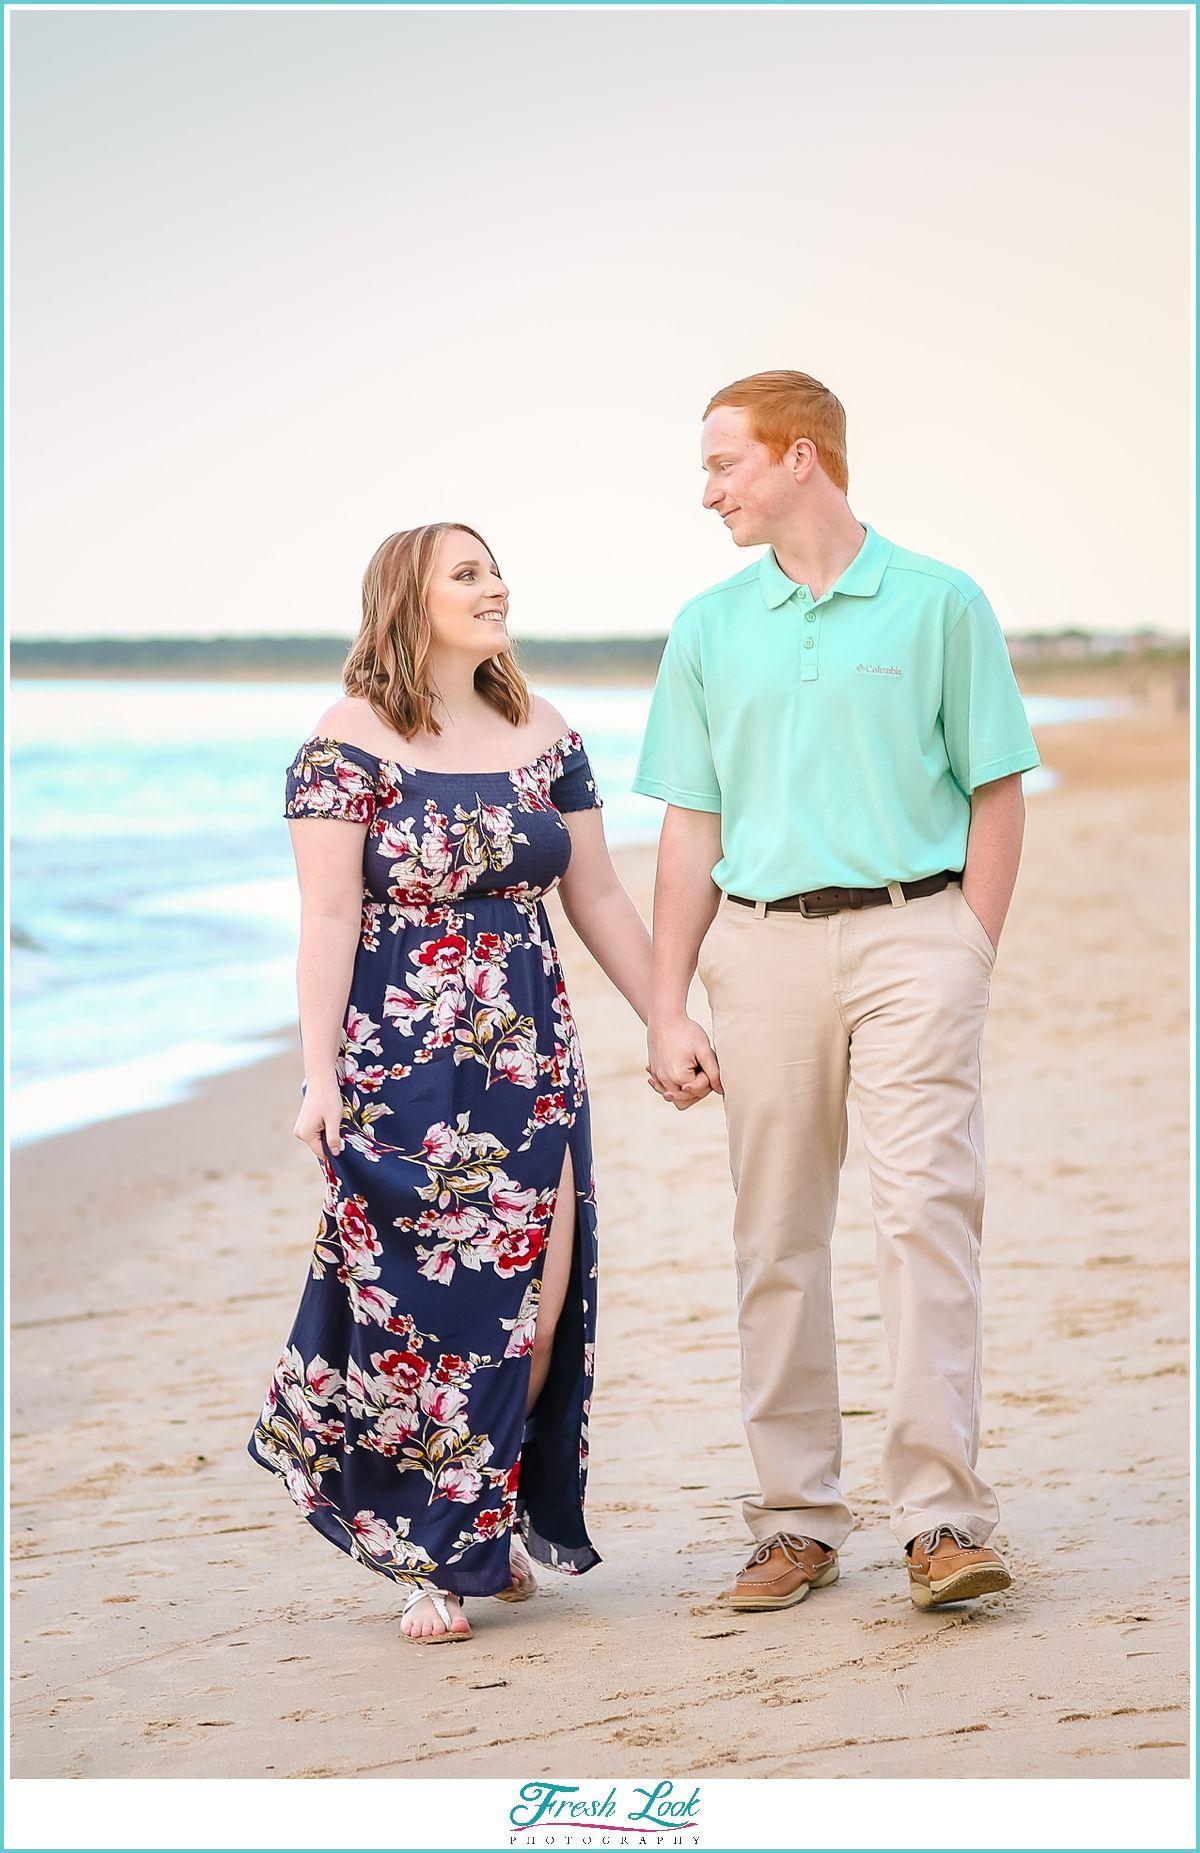 Virginia Beach Love Story Love story, Virginia beach